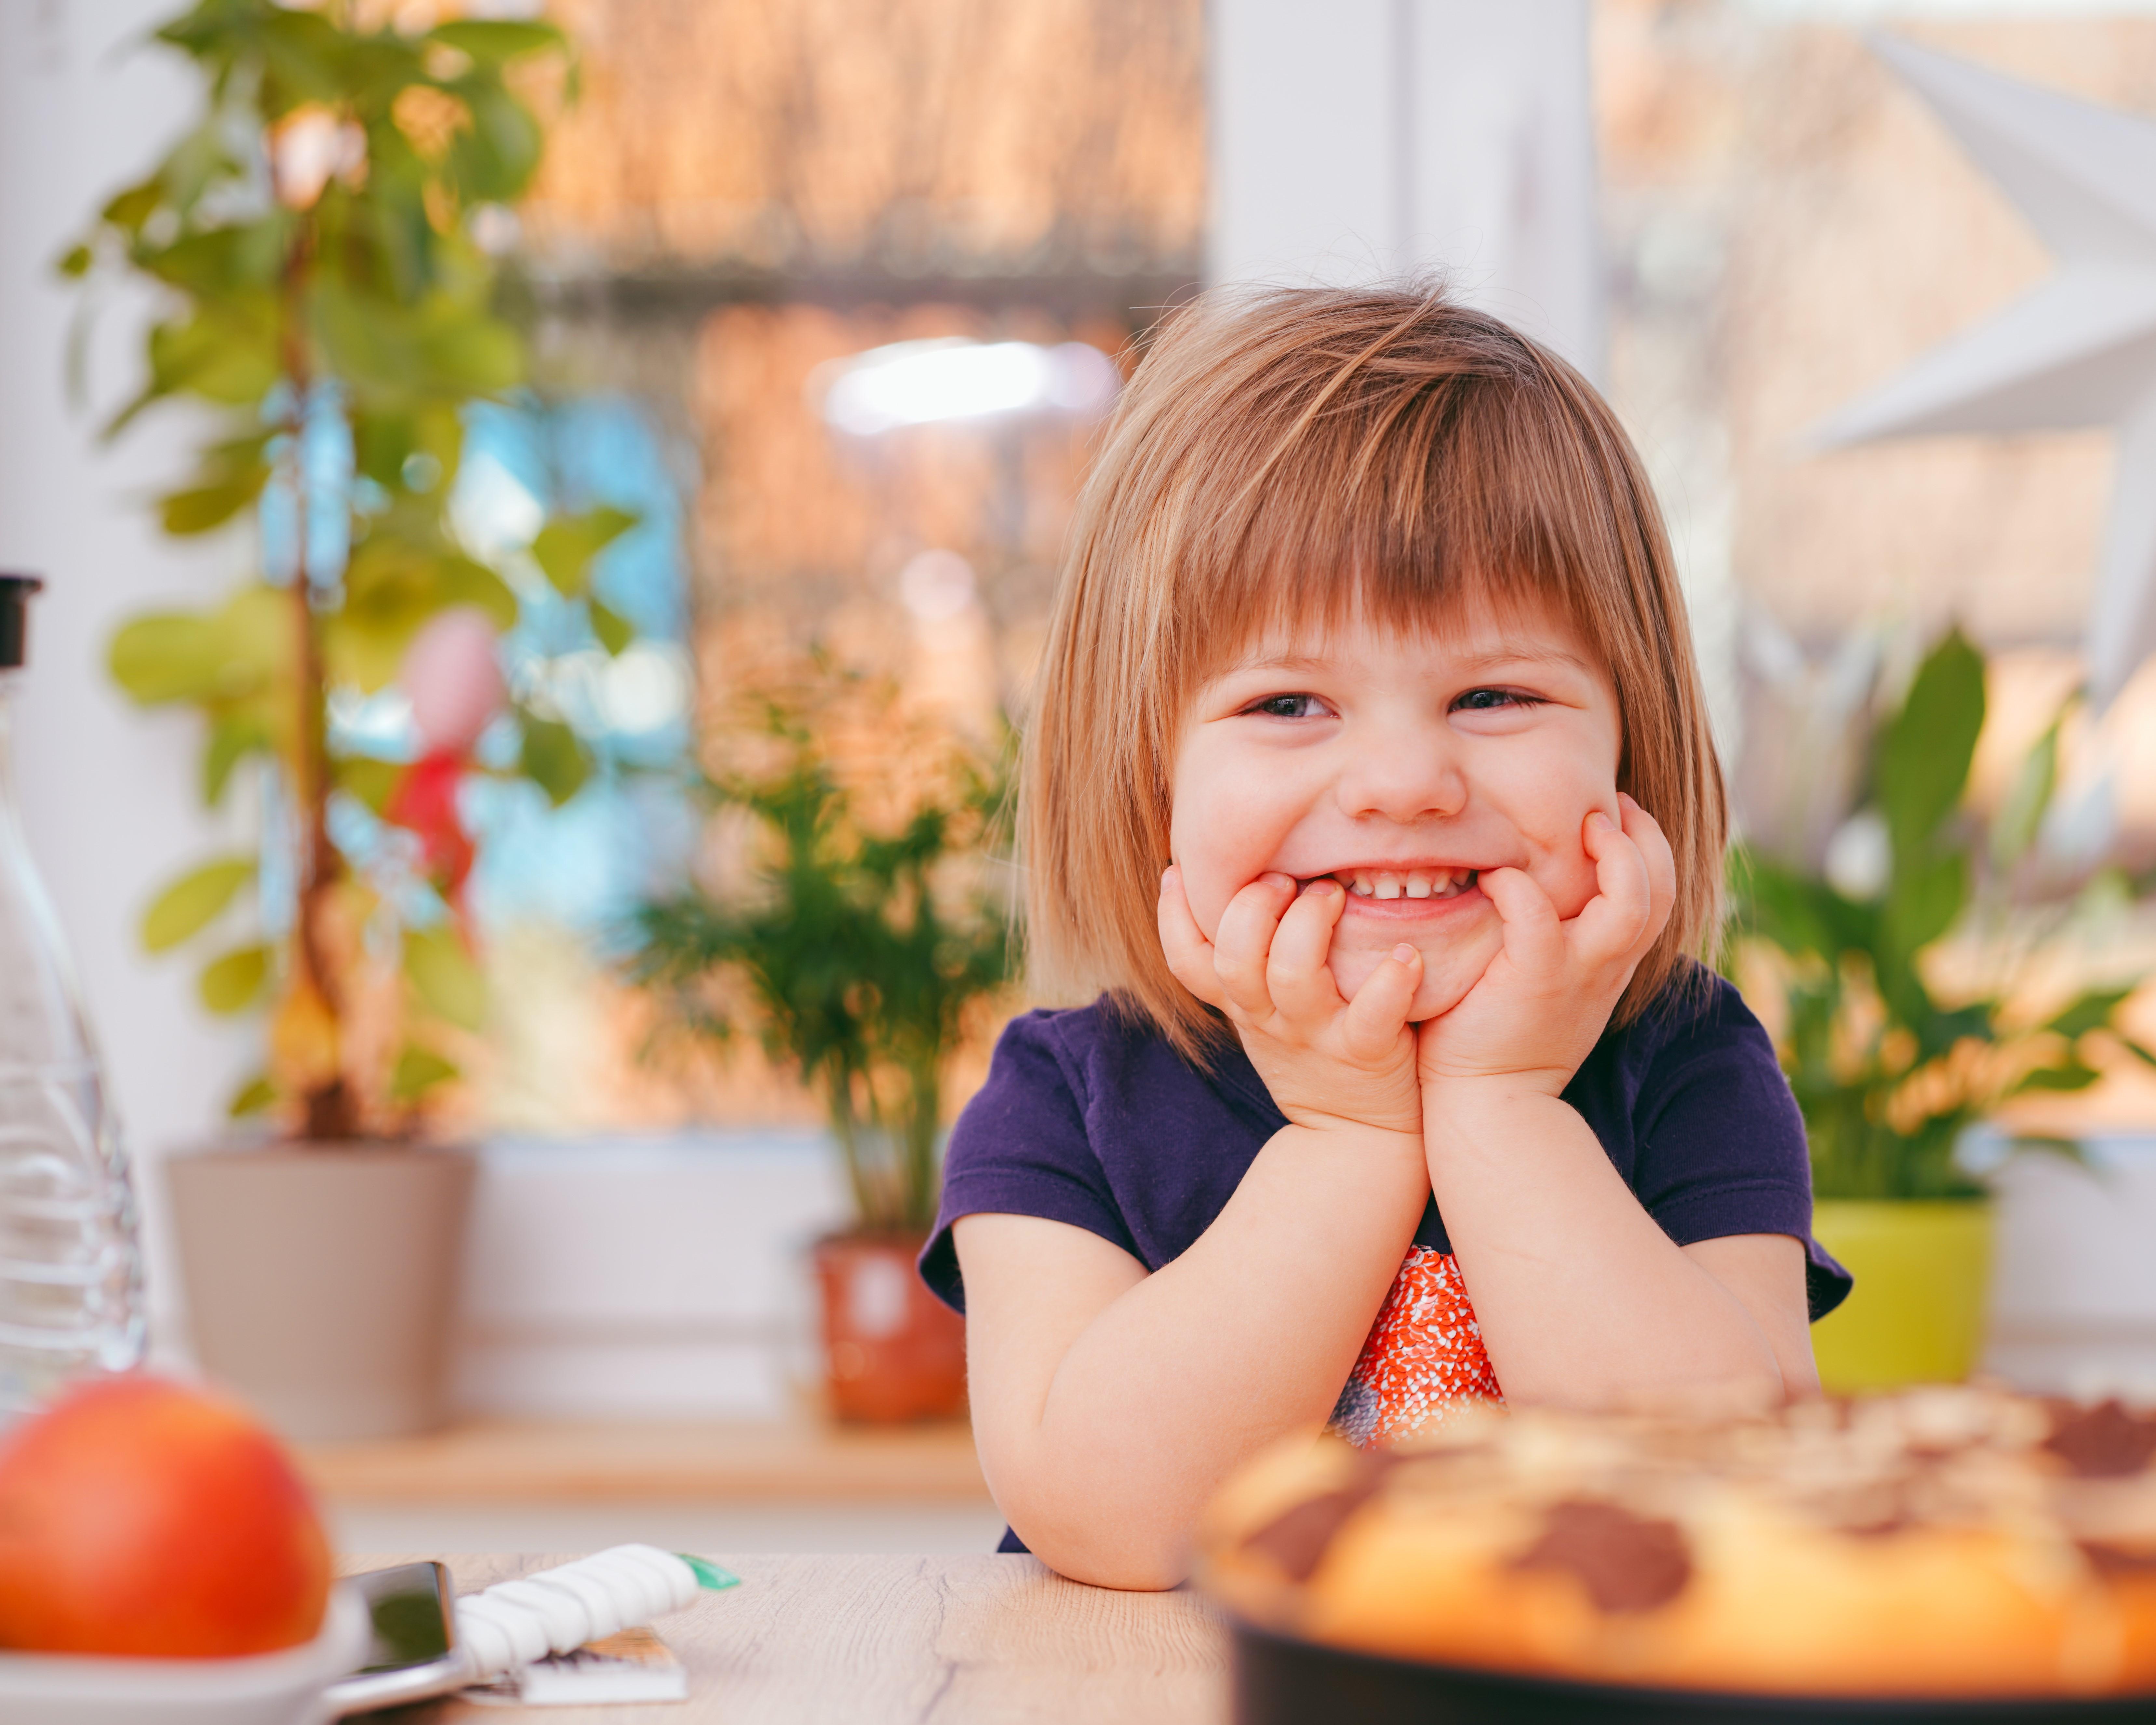 photo-of-toddler-smiling-1912868